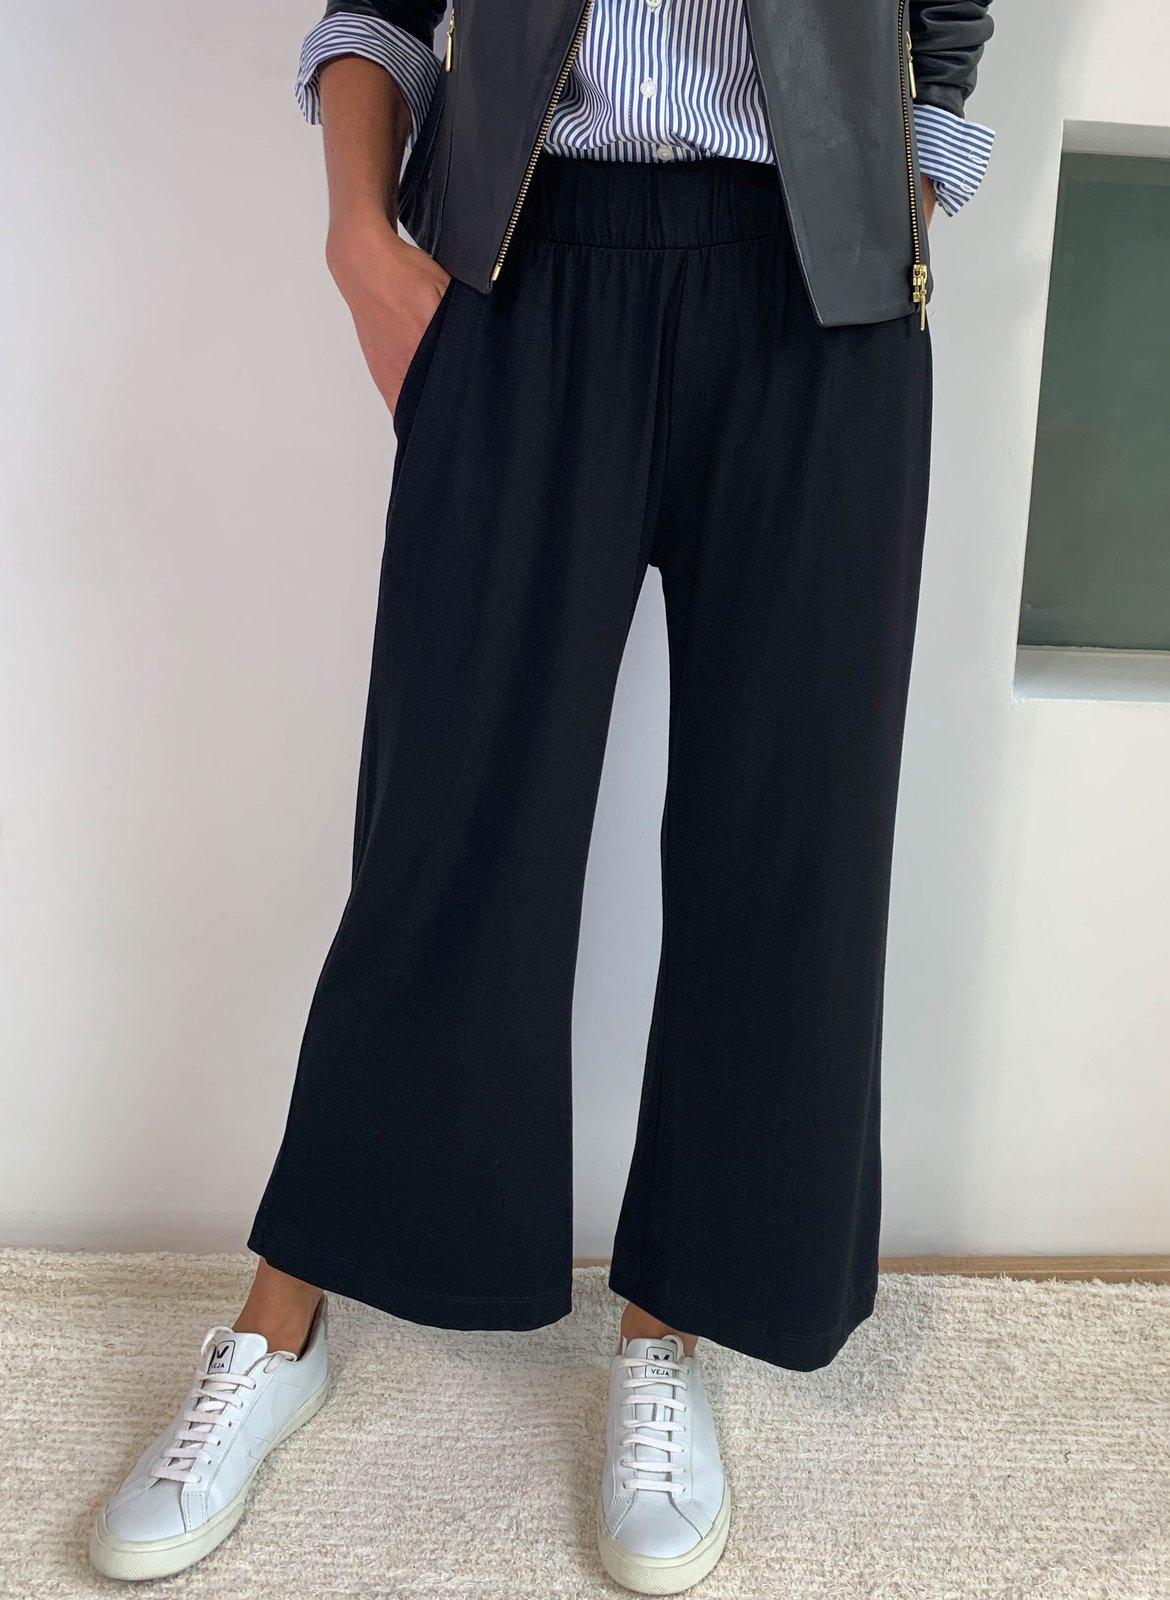 baukjen cropped palazzo trouser